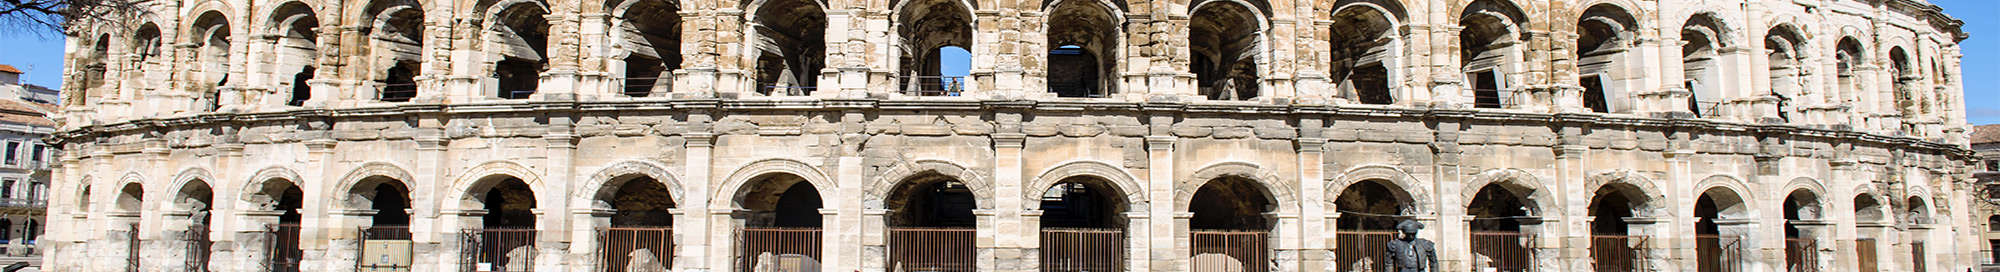 Week-end et séjour à Nîmes